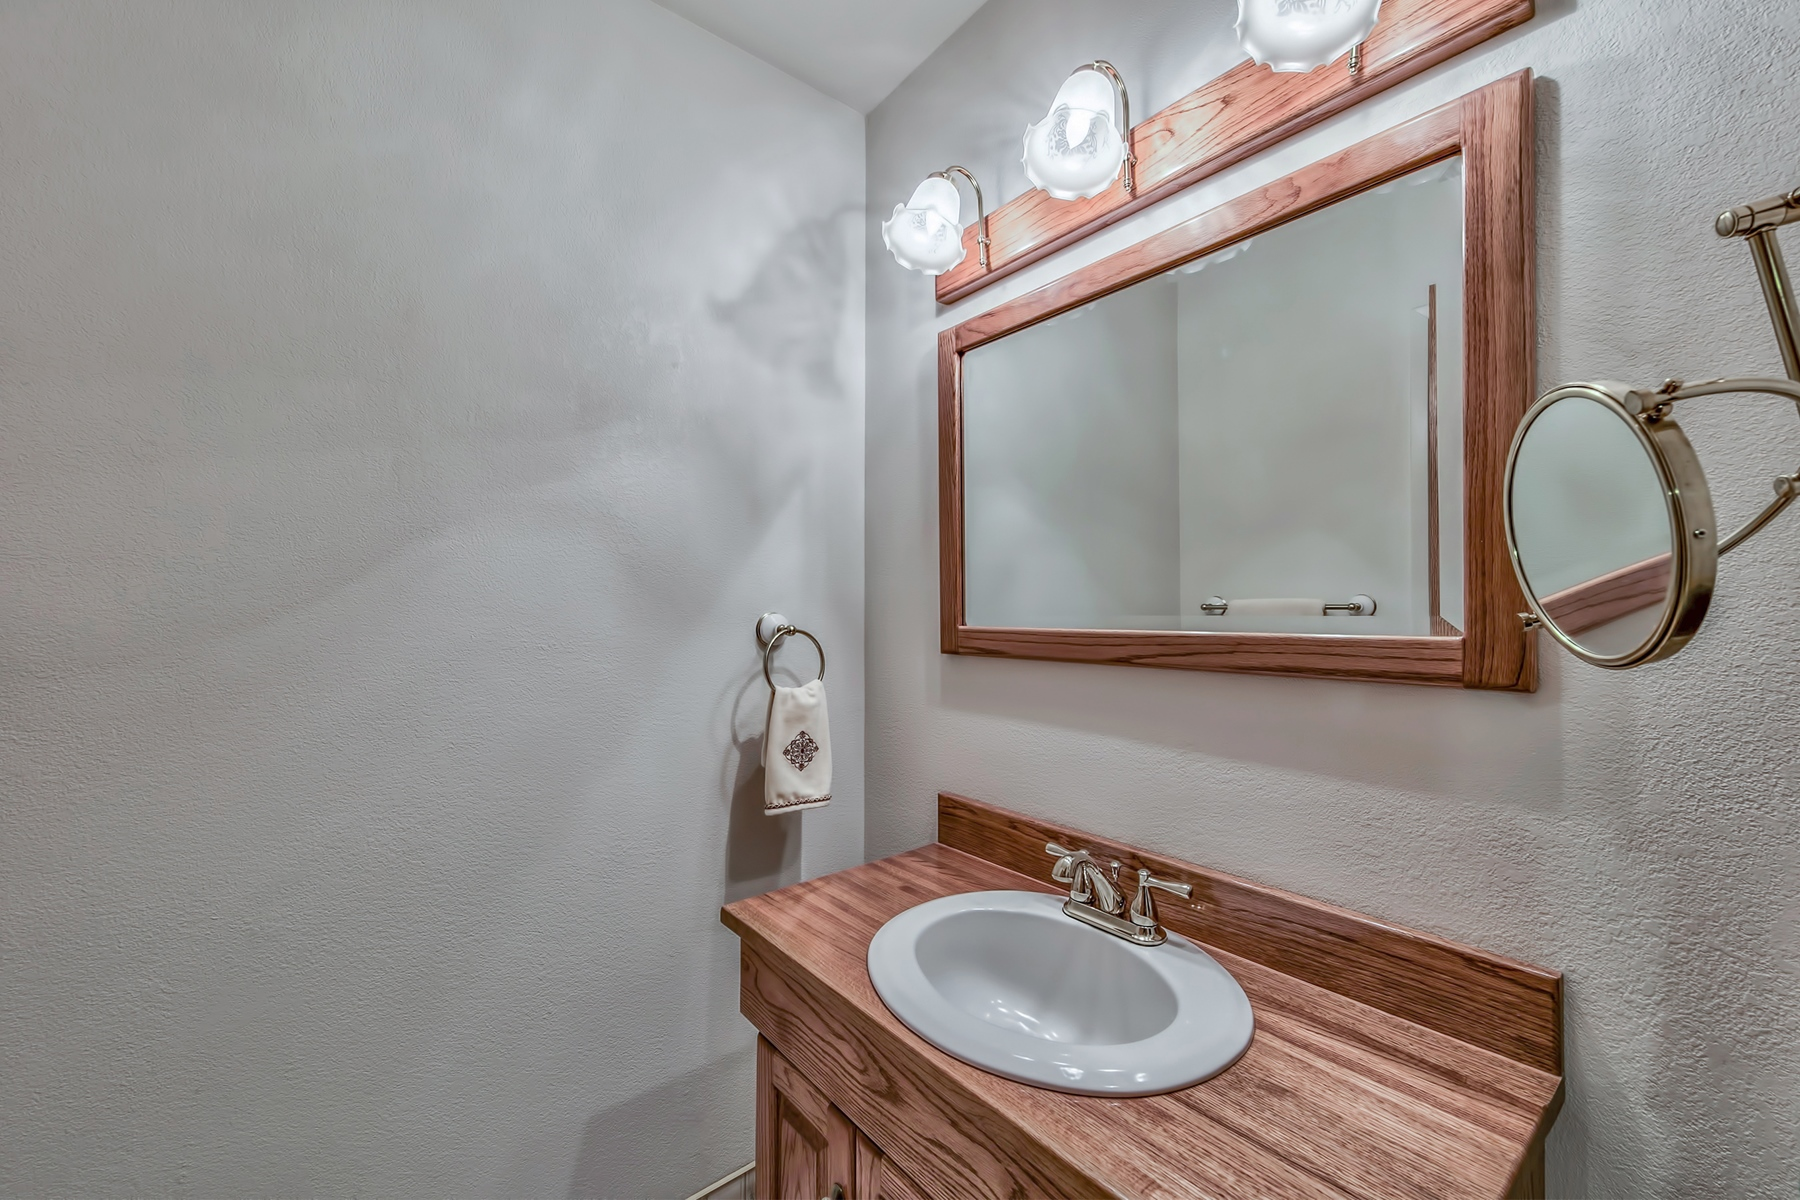 Additional photo for property listing at 1439 Ski Run Blvd #H-1, South Lake Tahoe, CA 96150 1439 Ski Run Blvd #H-1 South Lake Tahoe, California 96150 United States